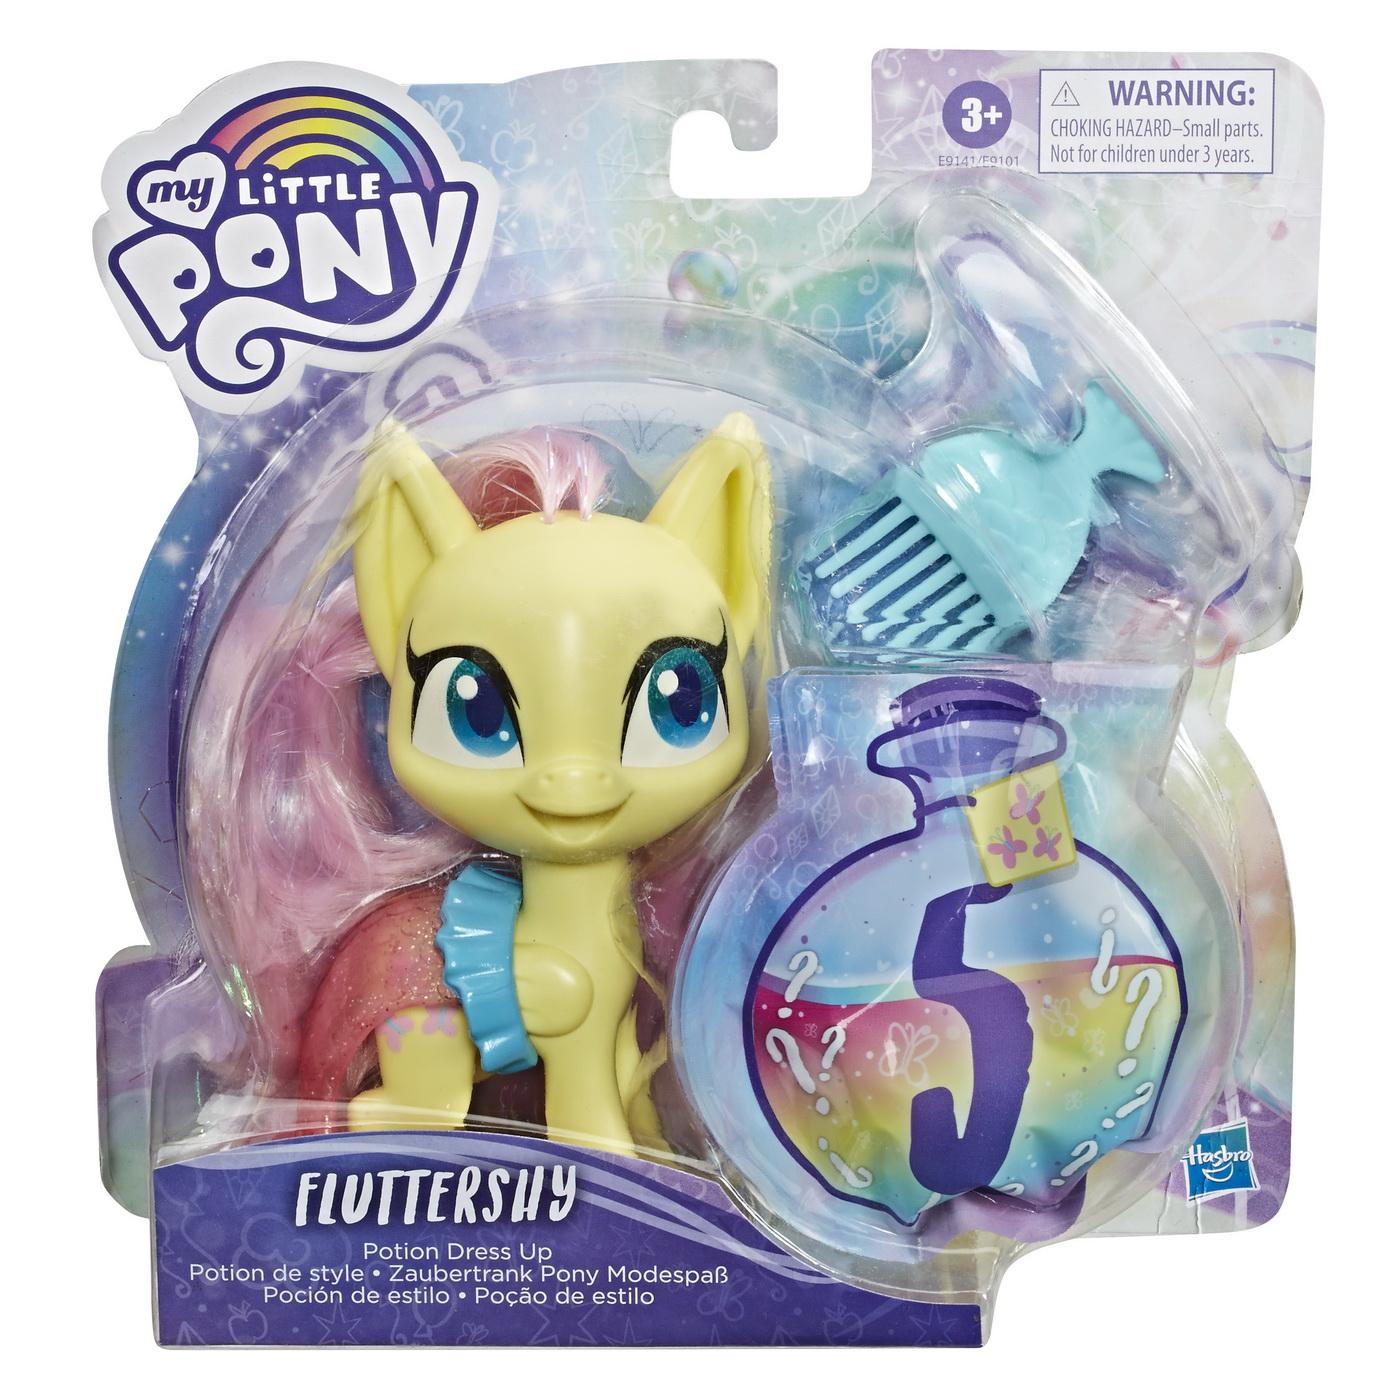 My Lttle Pony Poneiul Fluttershy potion dress up